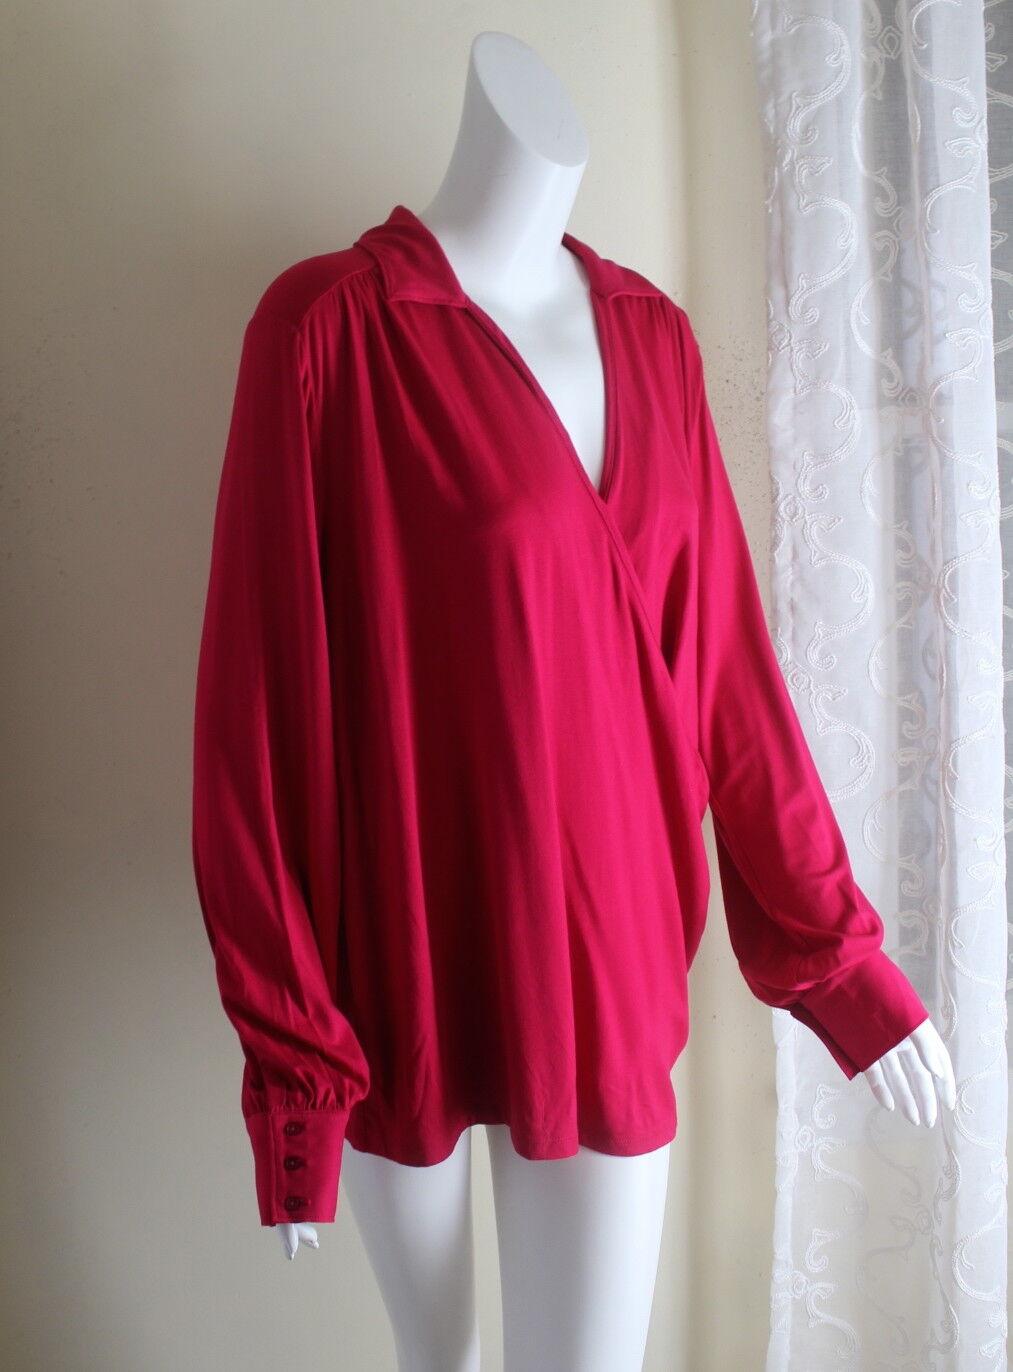 NWT Talbots -Sz 1X Rich Fuchsia Rosa Elegant Jersey Knit Wrap Shirt Top